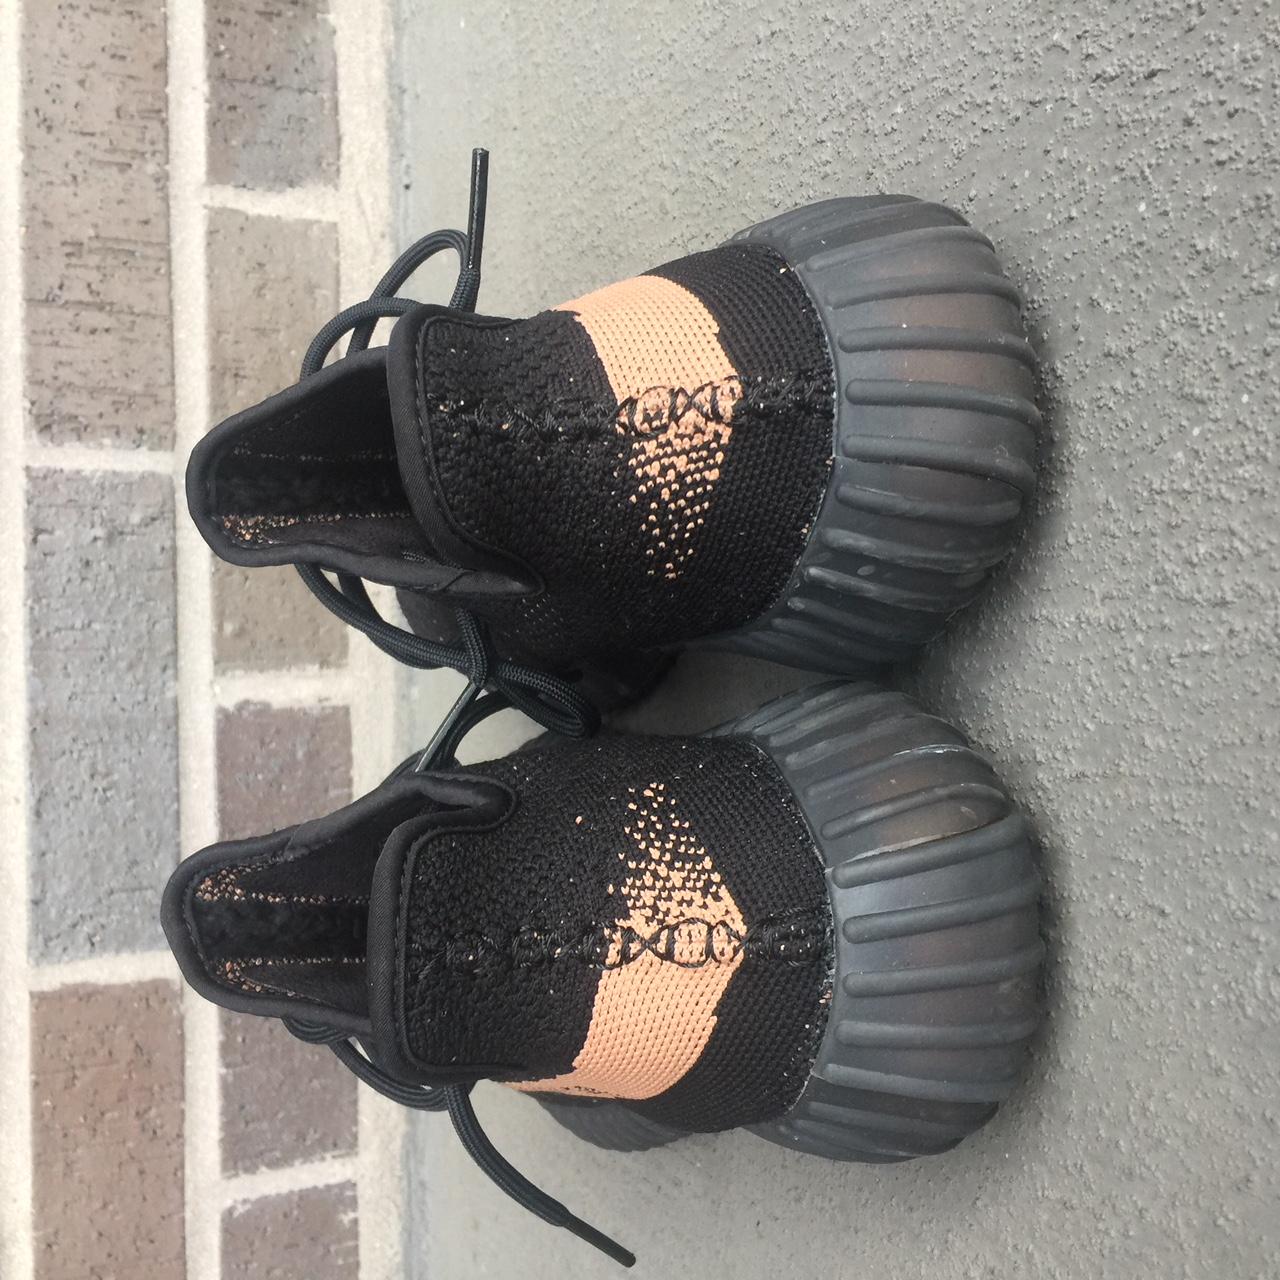 e26692c6f8fd2 Yeezy  350 V2 Core Black Copper sneakers on Storenvy